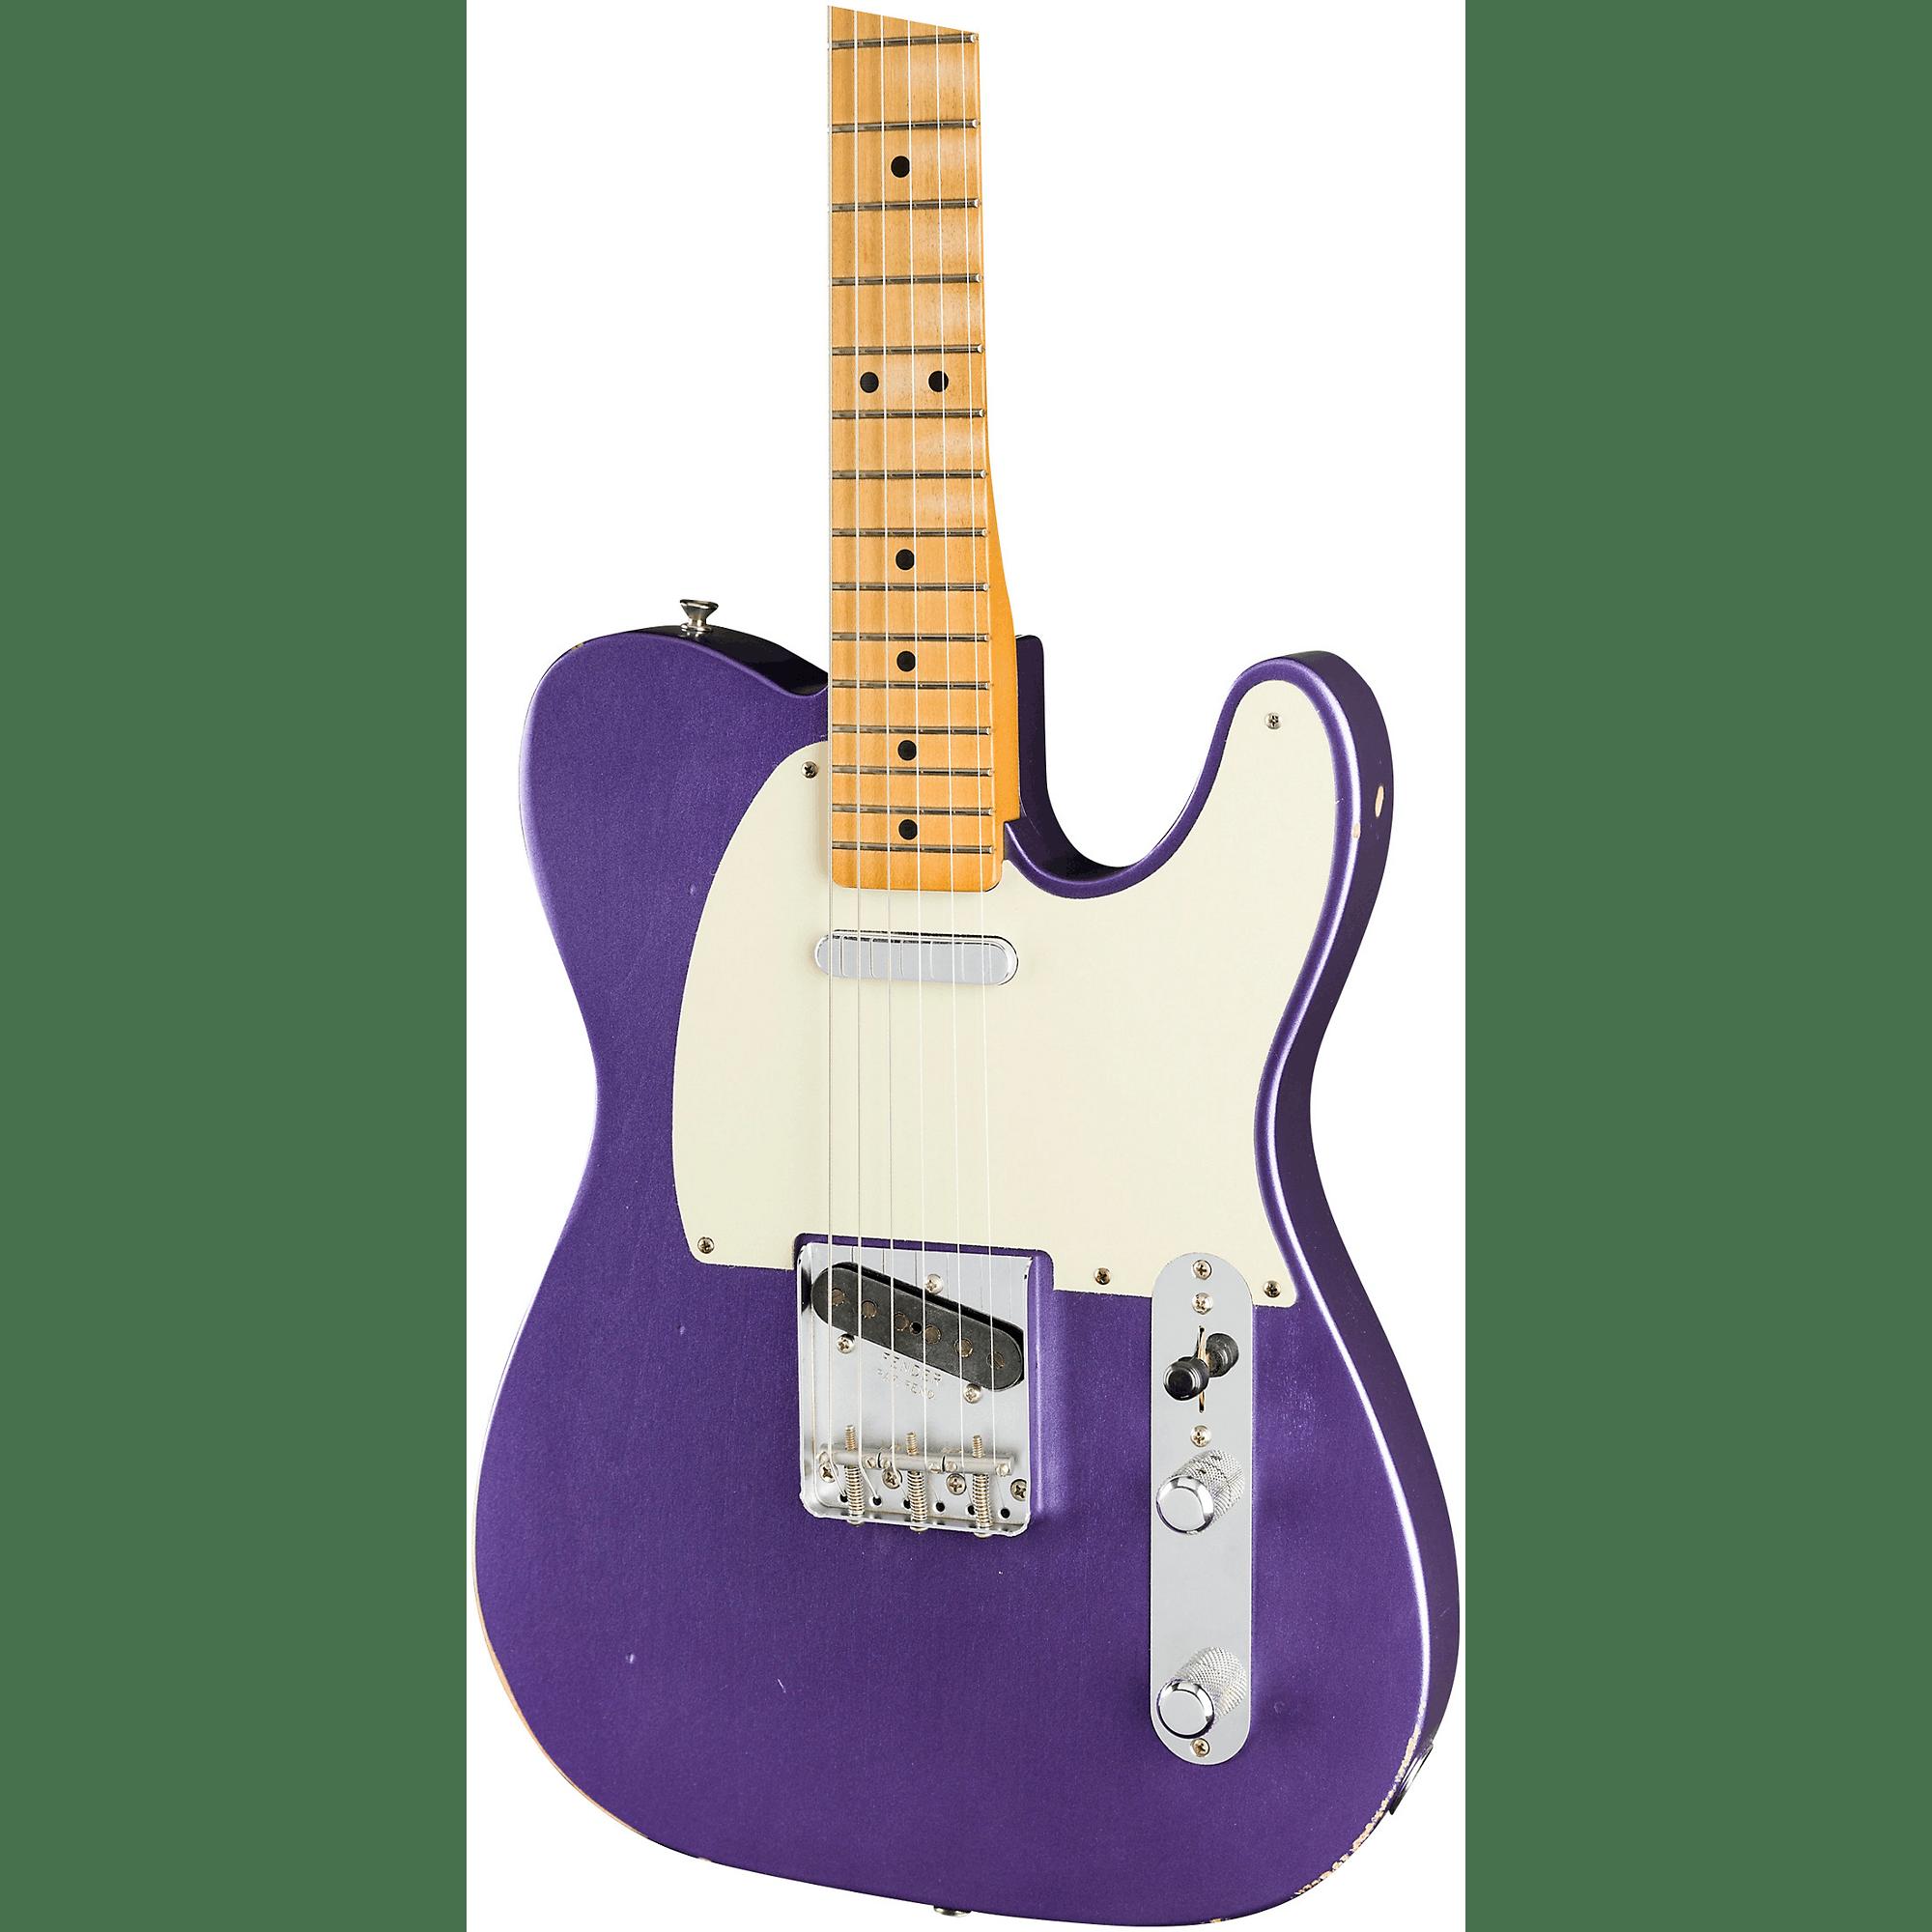 New Fender Tex-Mex Tele Telecaster Neck Pickup Tex Mex Gifts